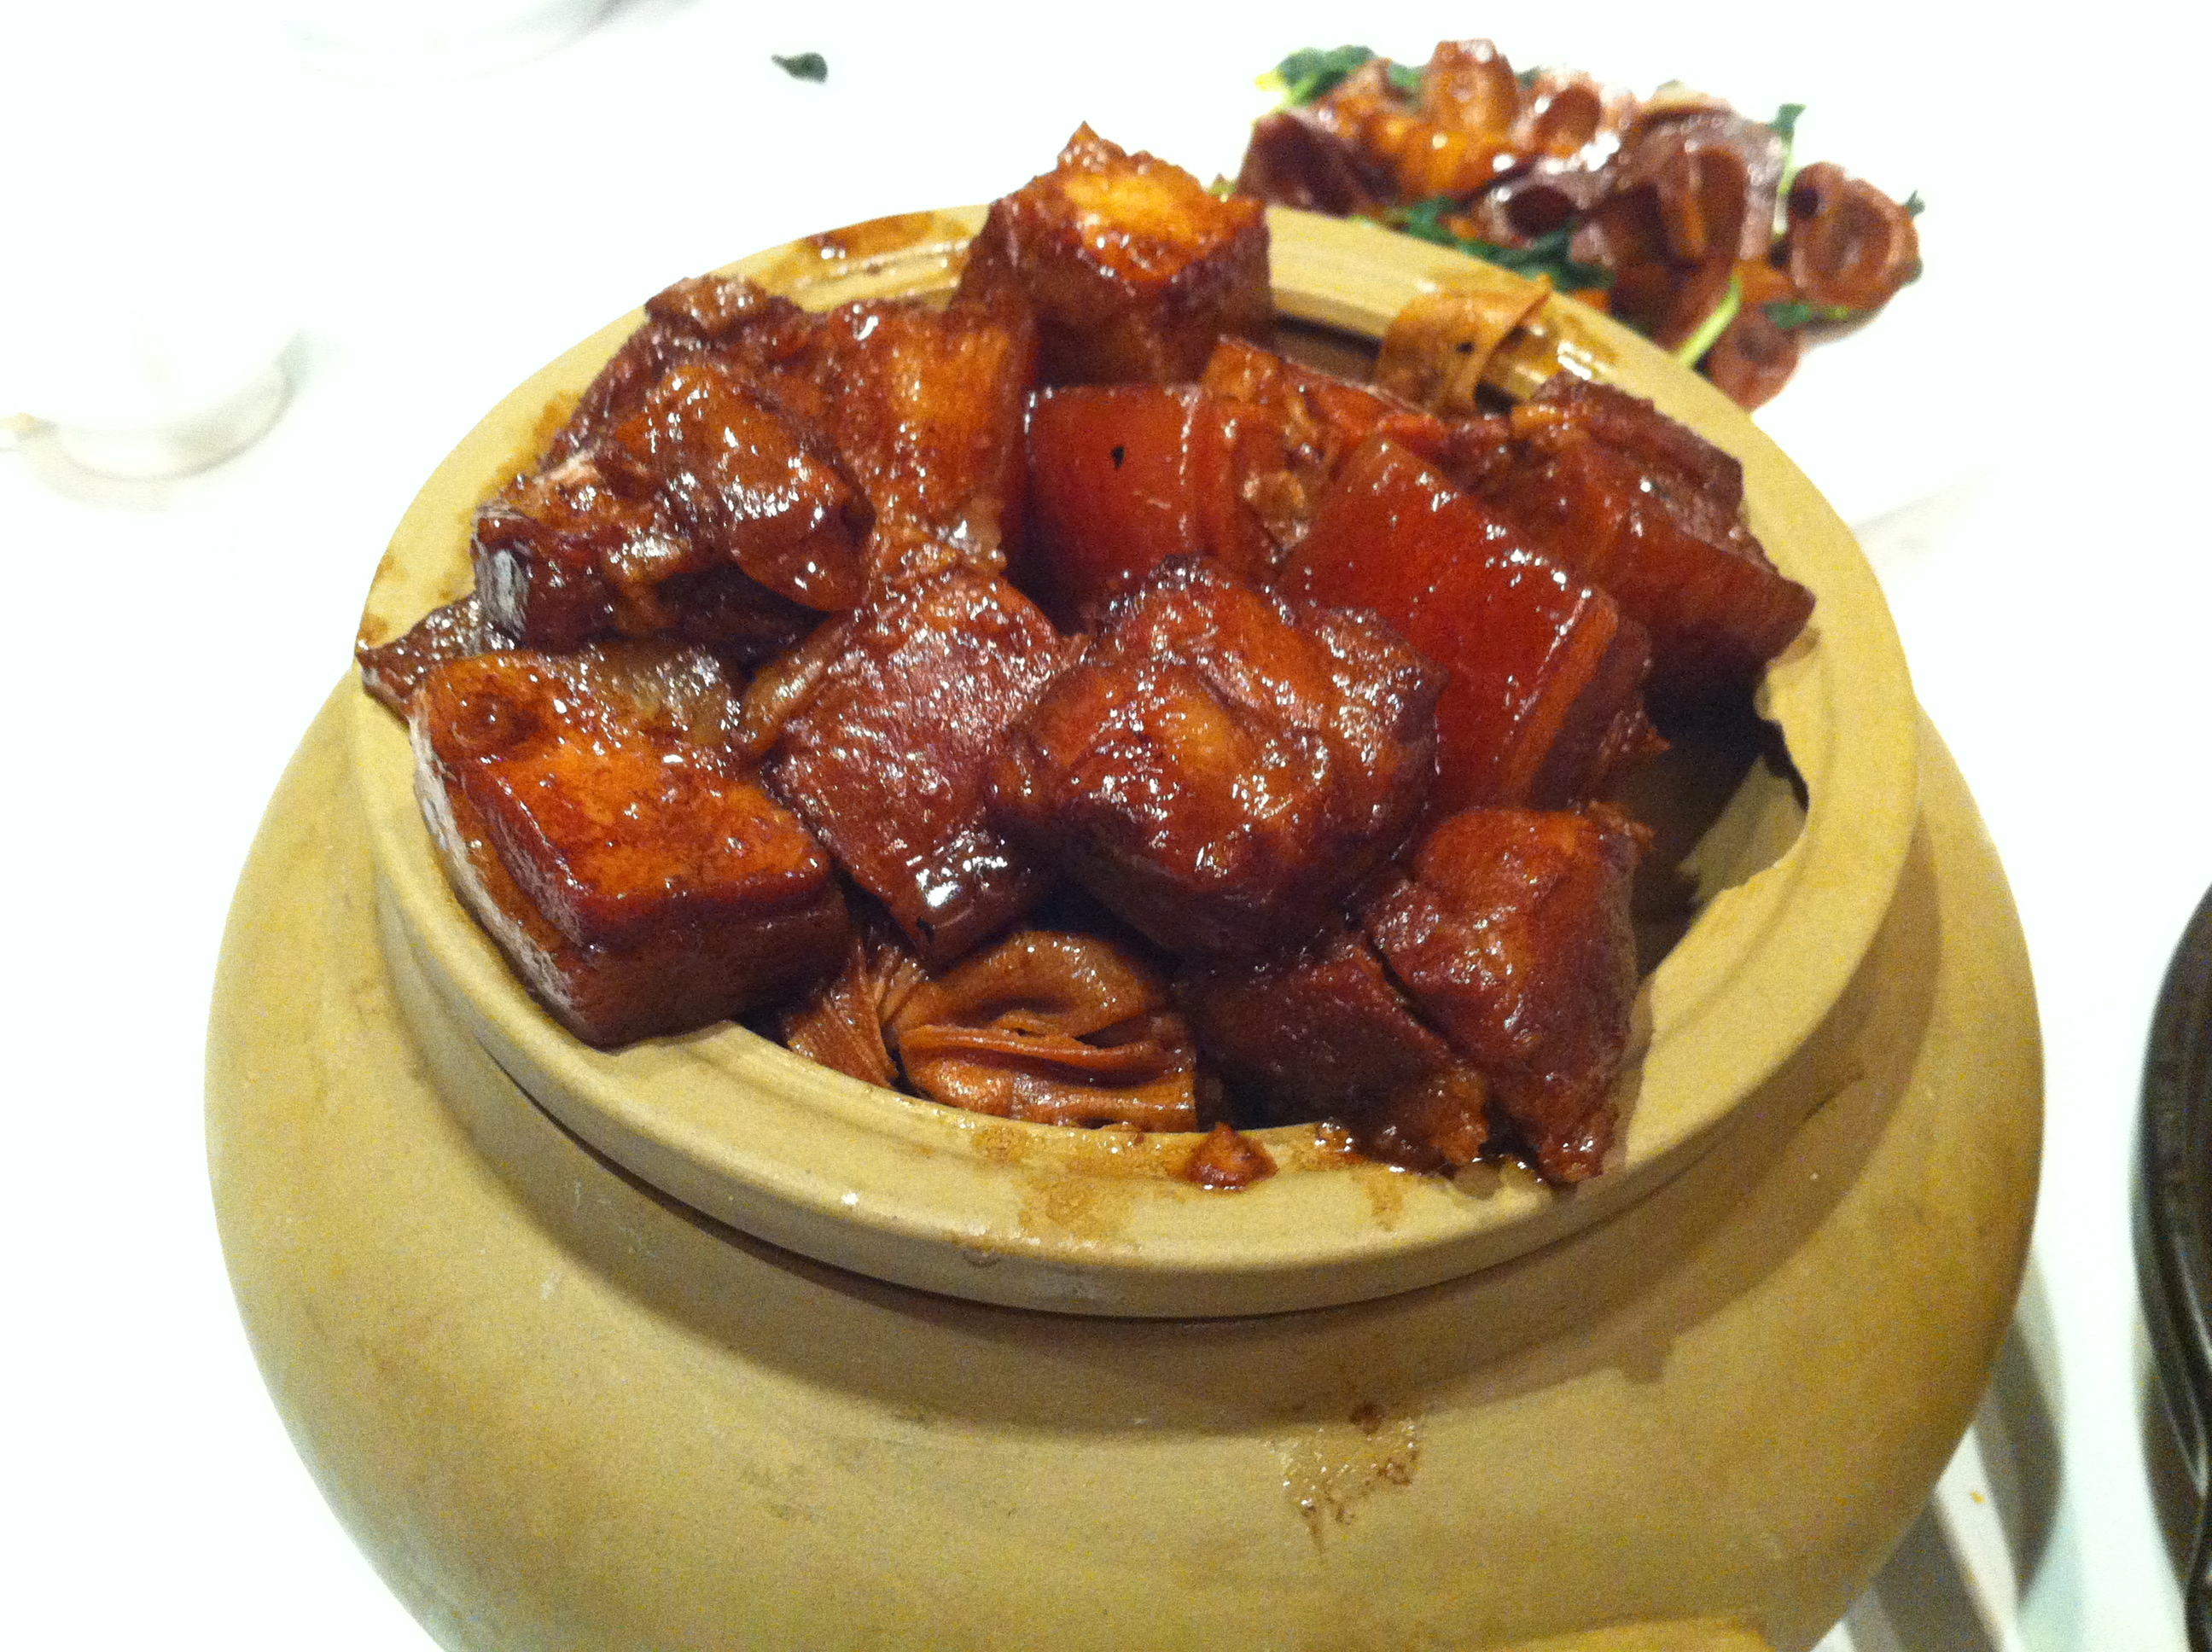 Red braised pork (20141106191221).JPG